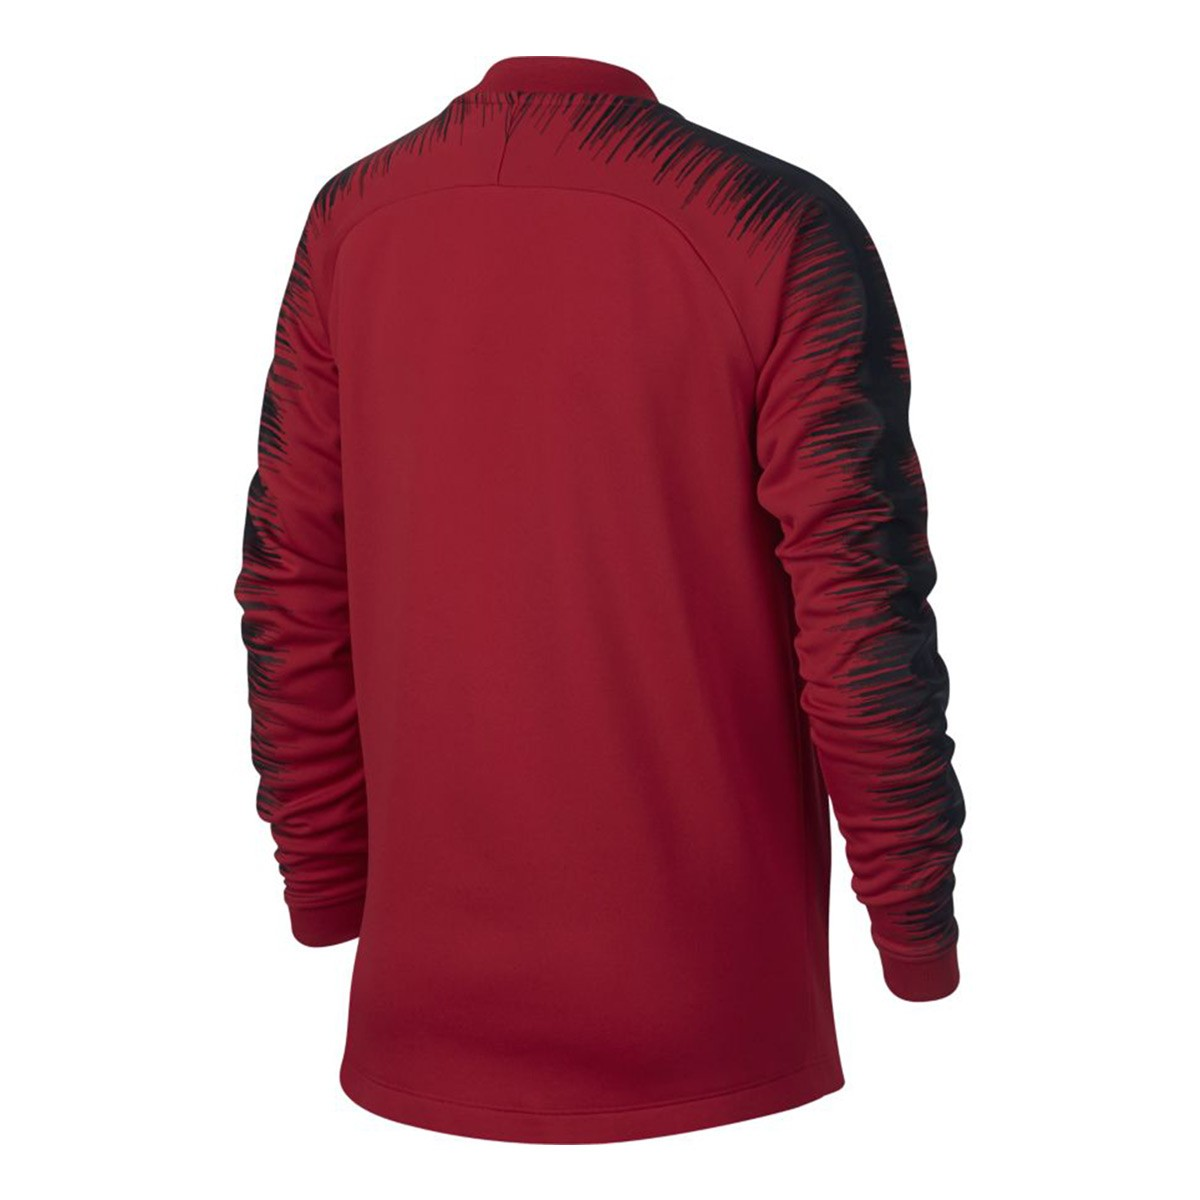 45fe66fe657ac Chaqueta Nike Portugal Pre-Match 2018-2019 Niño Gym red-Black - Tienda de fútbol  Fútbol Emotion